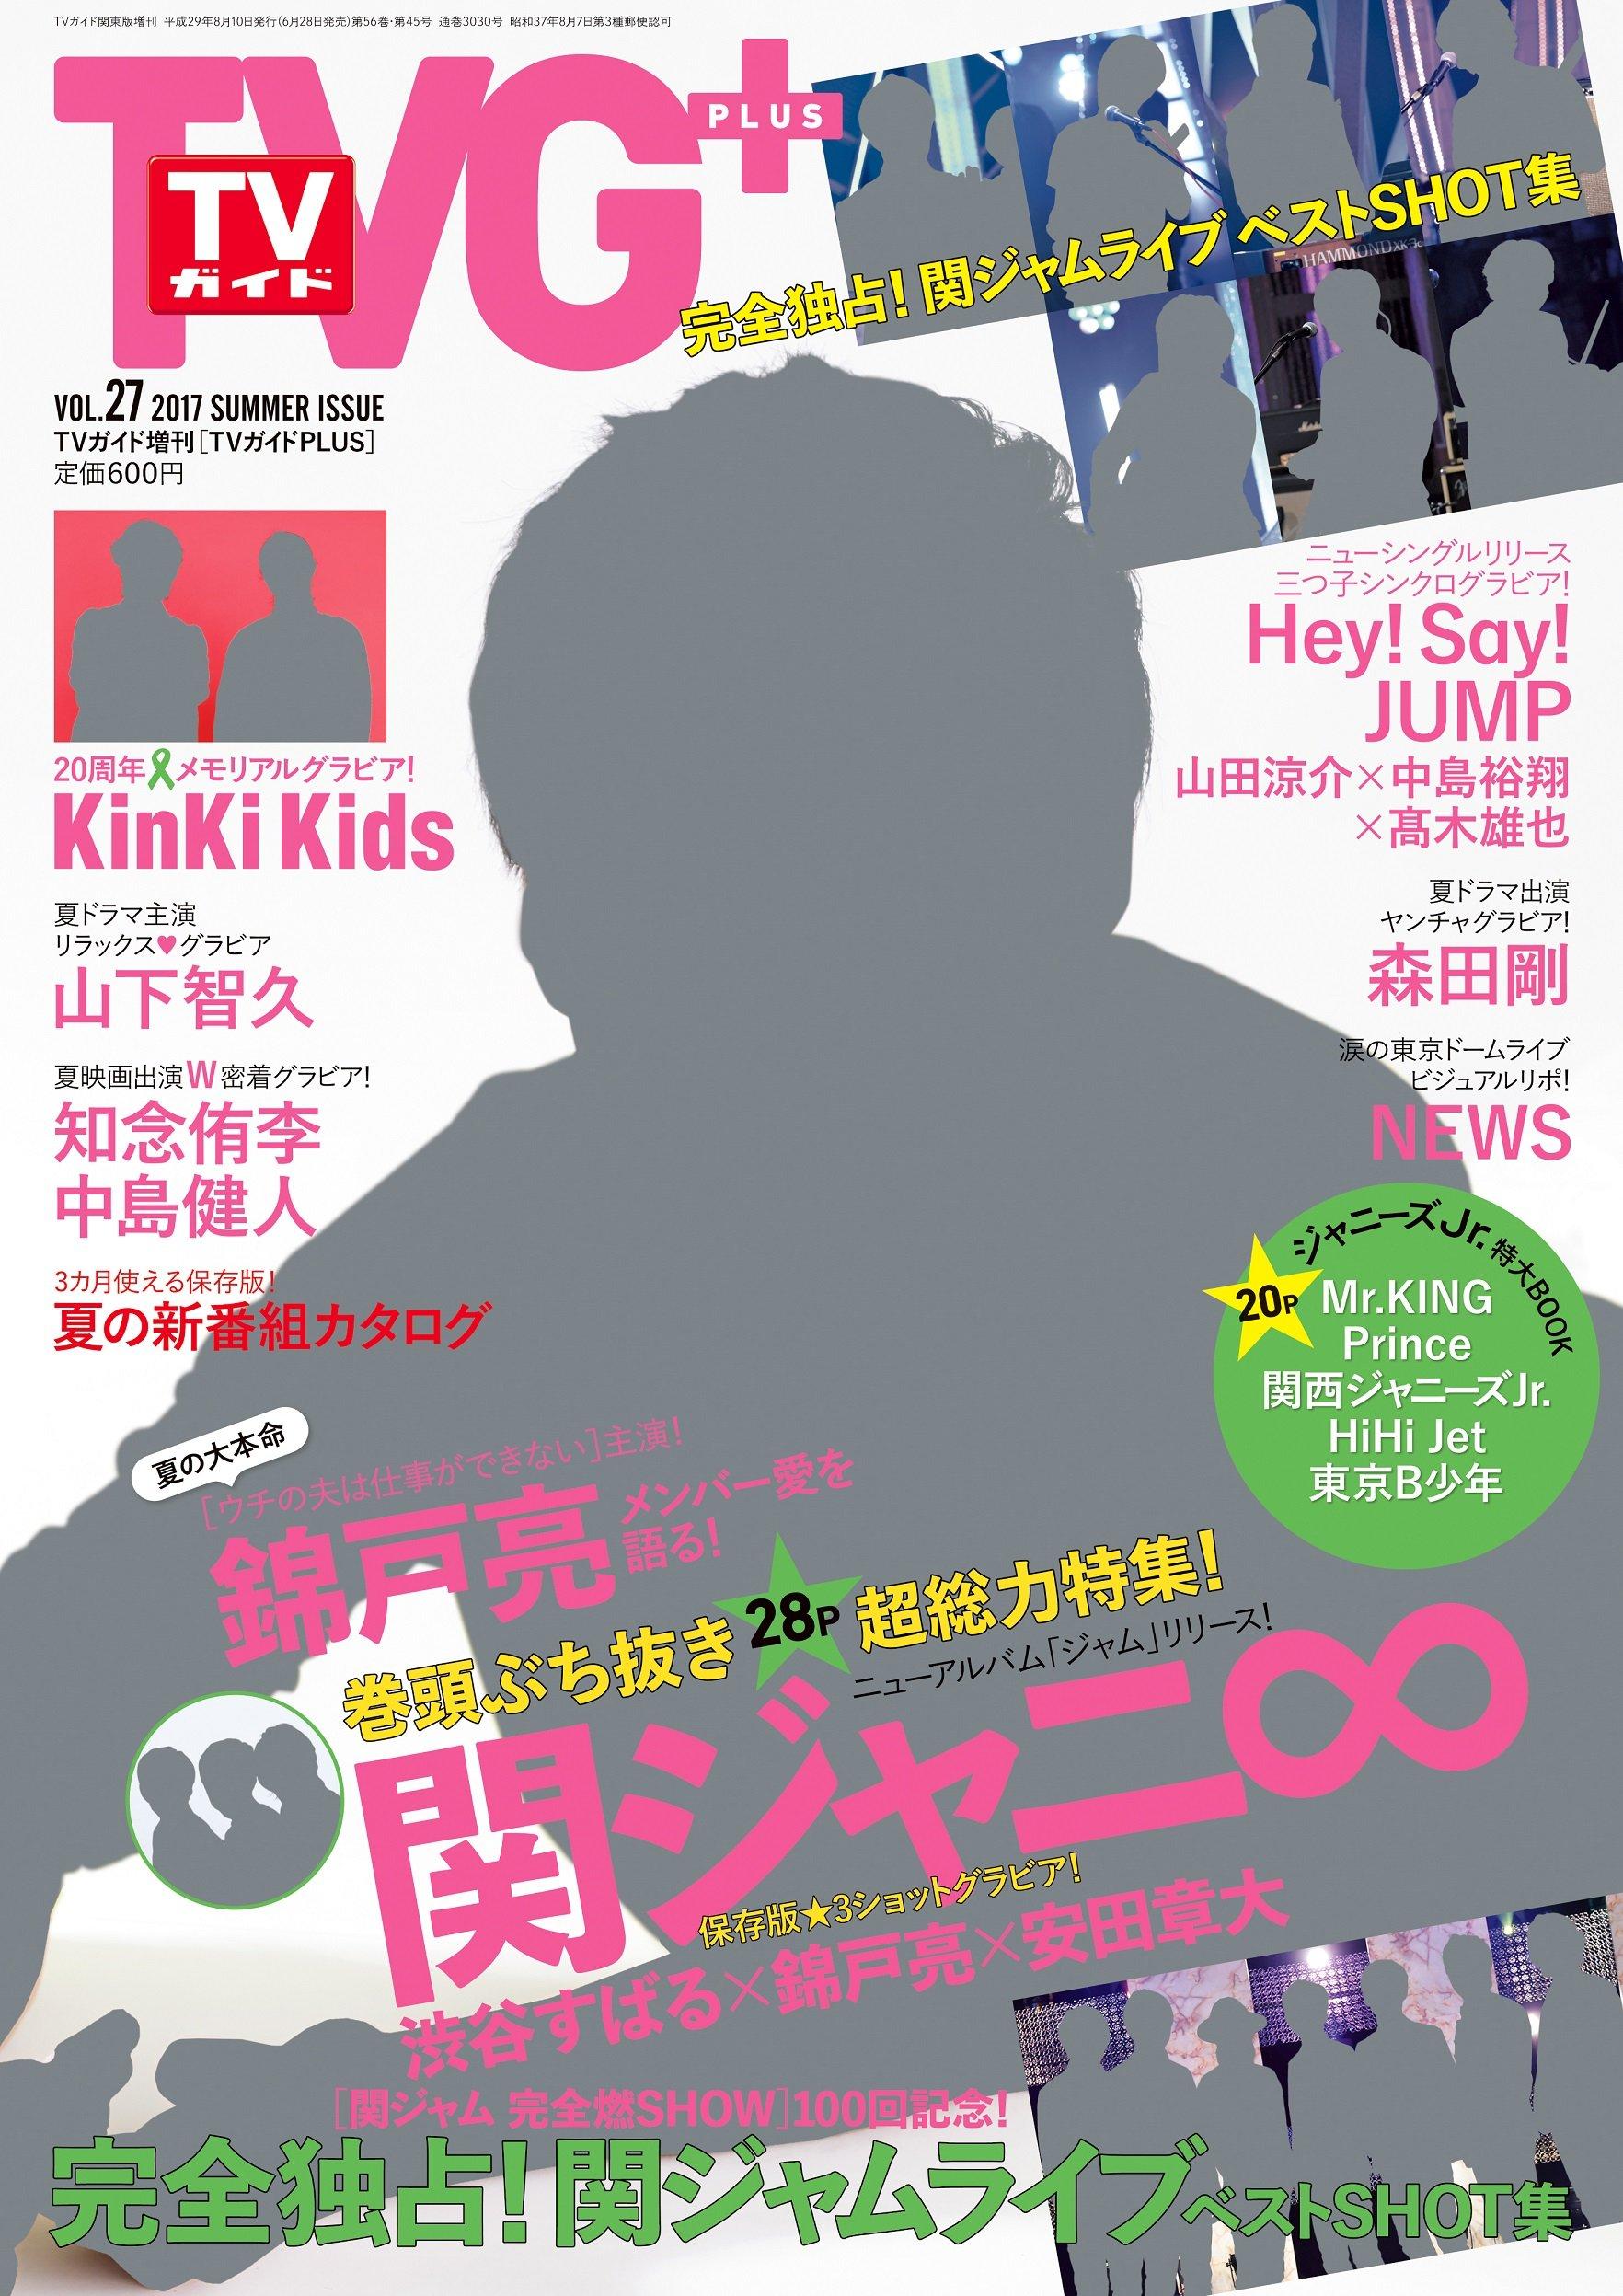 TVガイド関東版増刊 2017年8月号 TVガイドPLUS vol.27